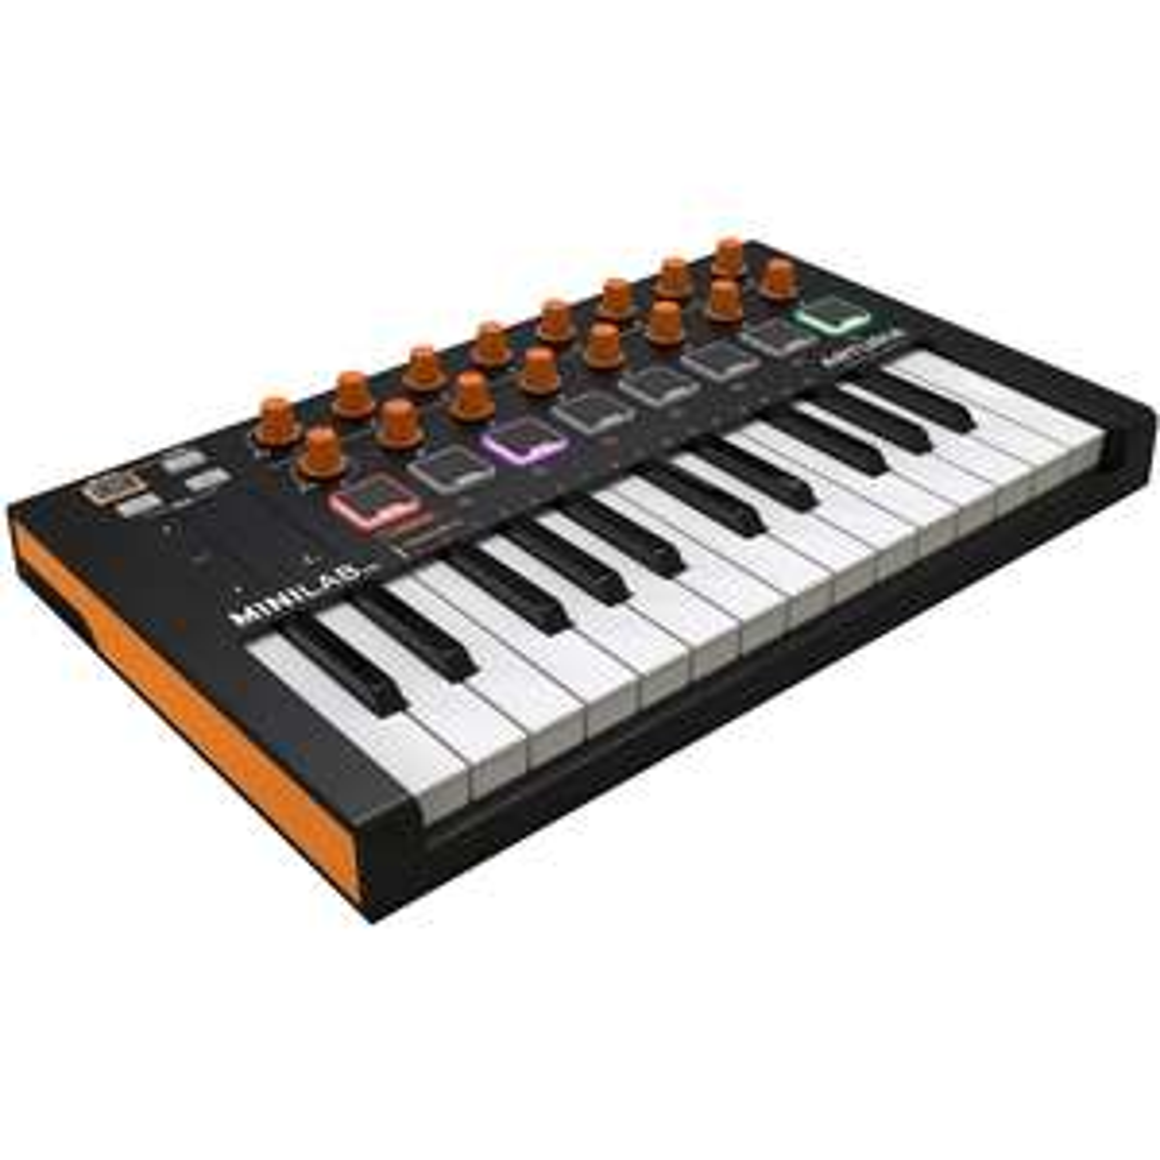 Clavier midi minilab mk2 Arturia - Orange